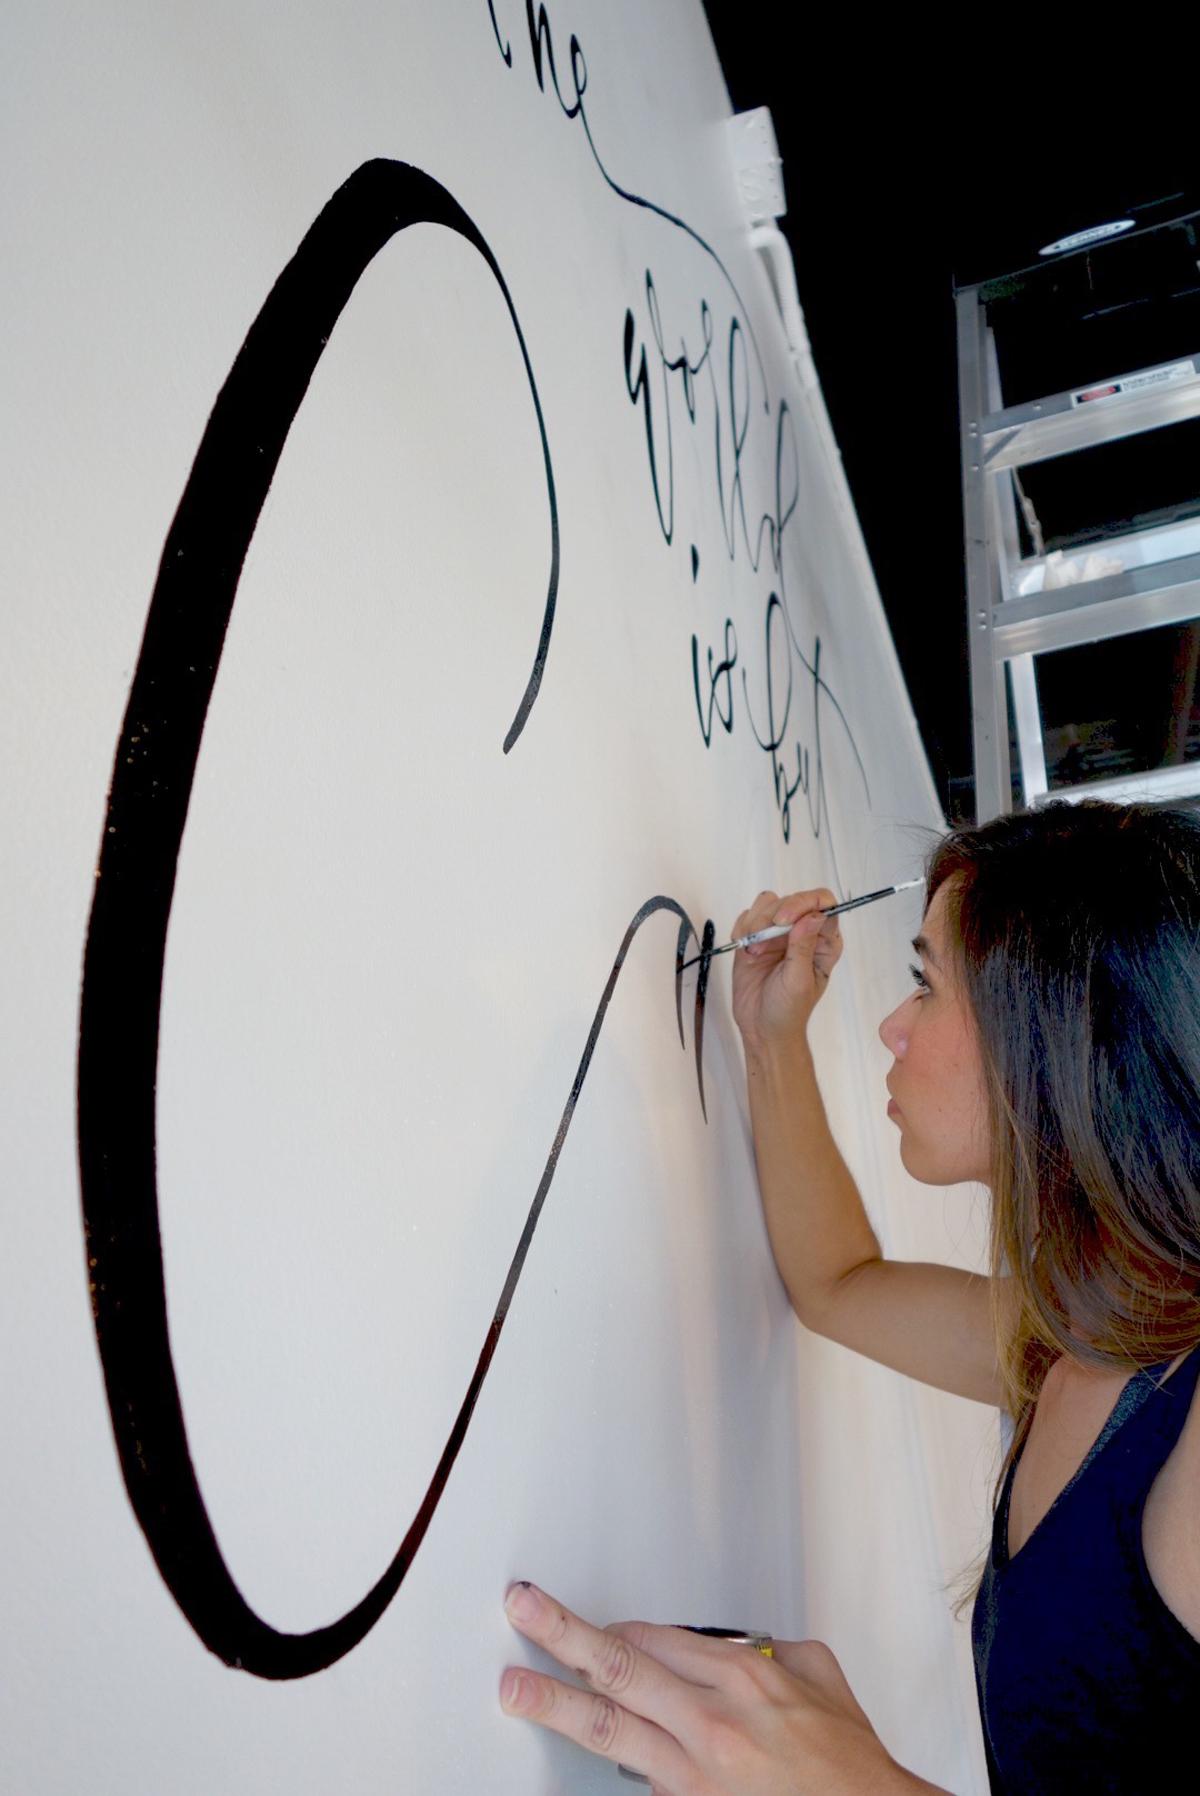 calligraphy-mural-process-shot-angeliqueink.jpg